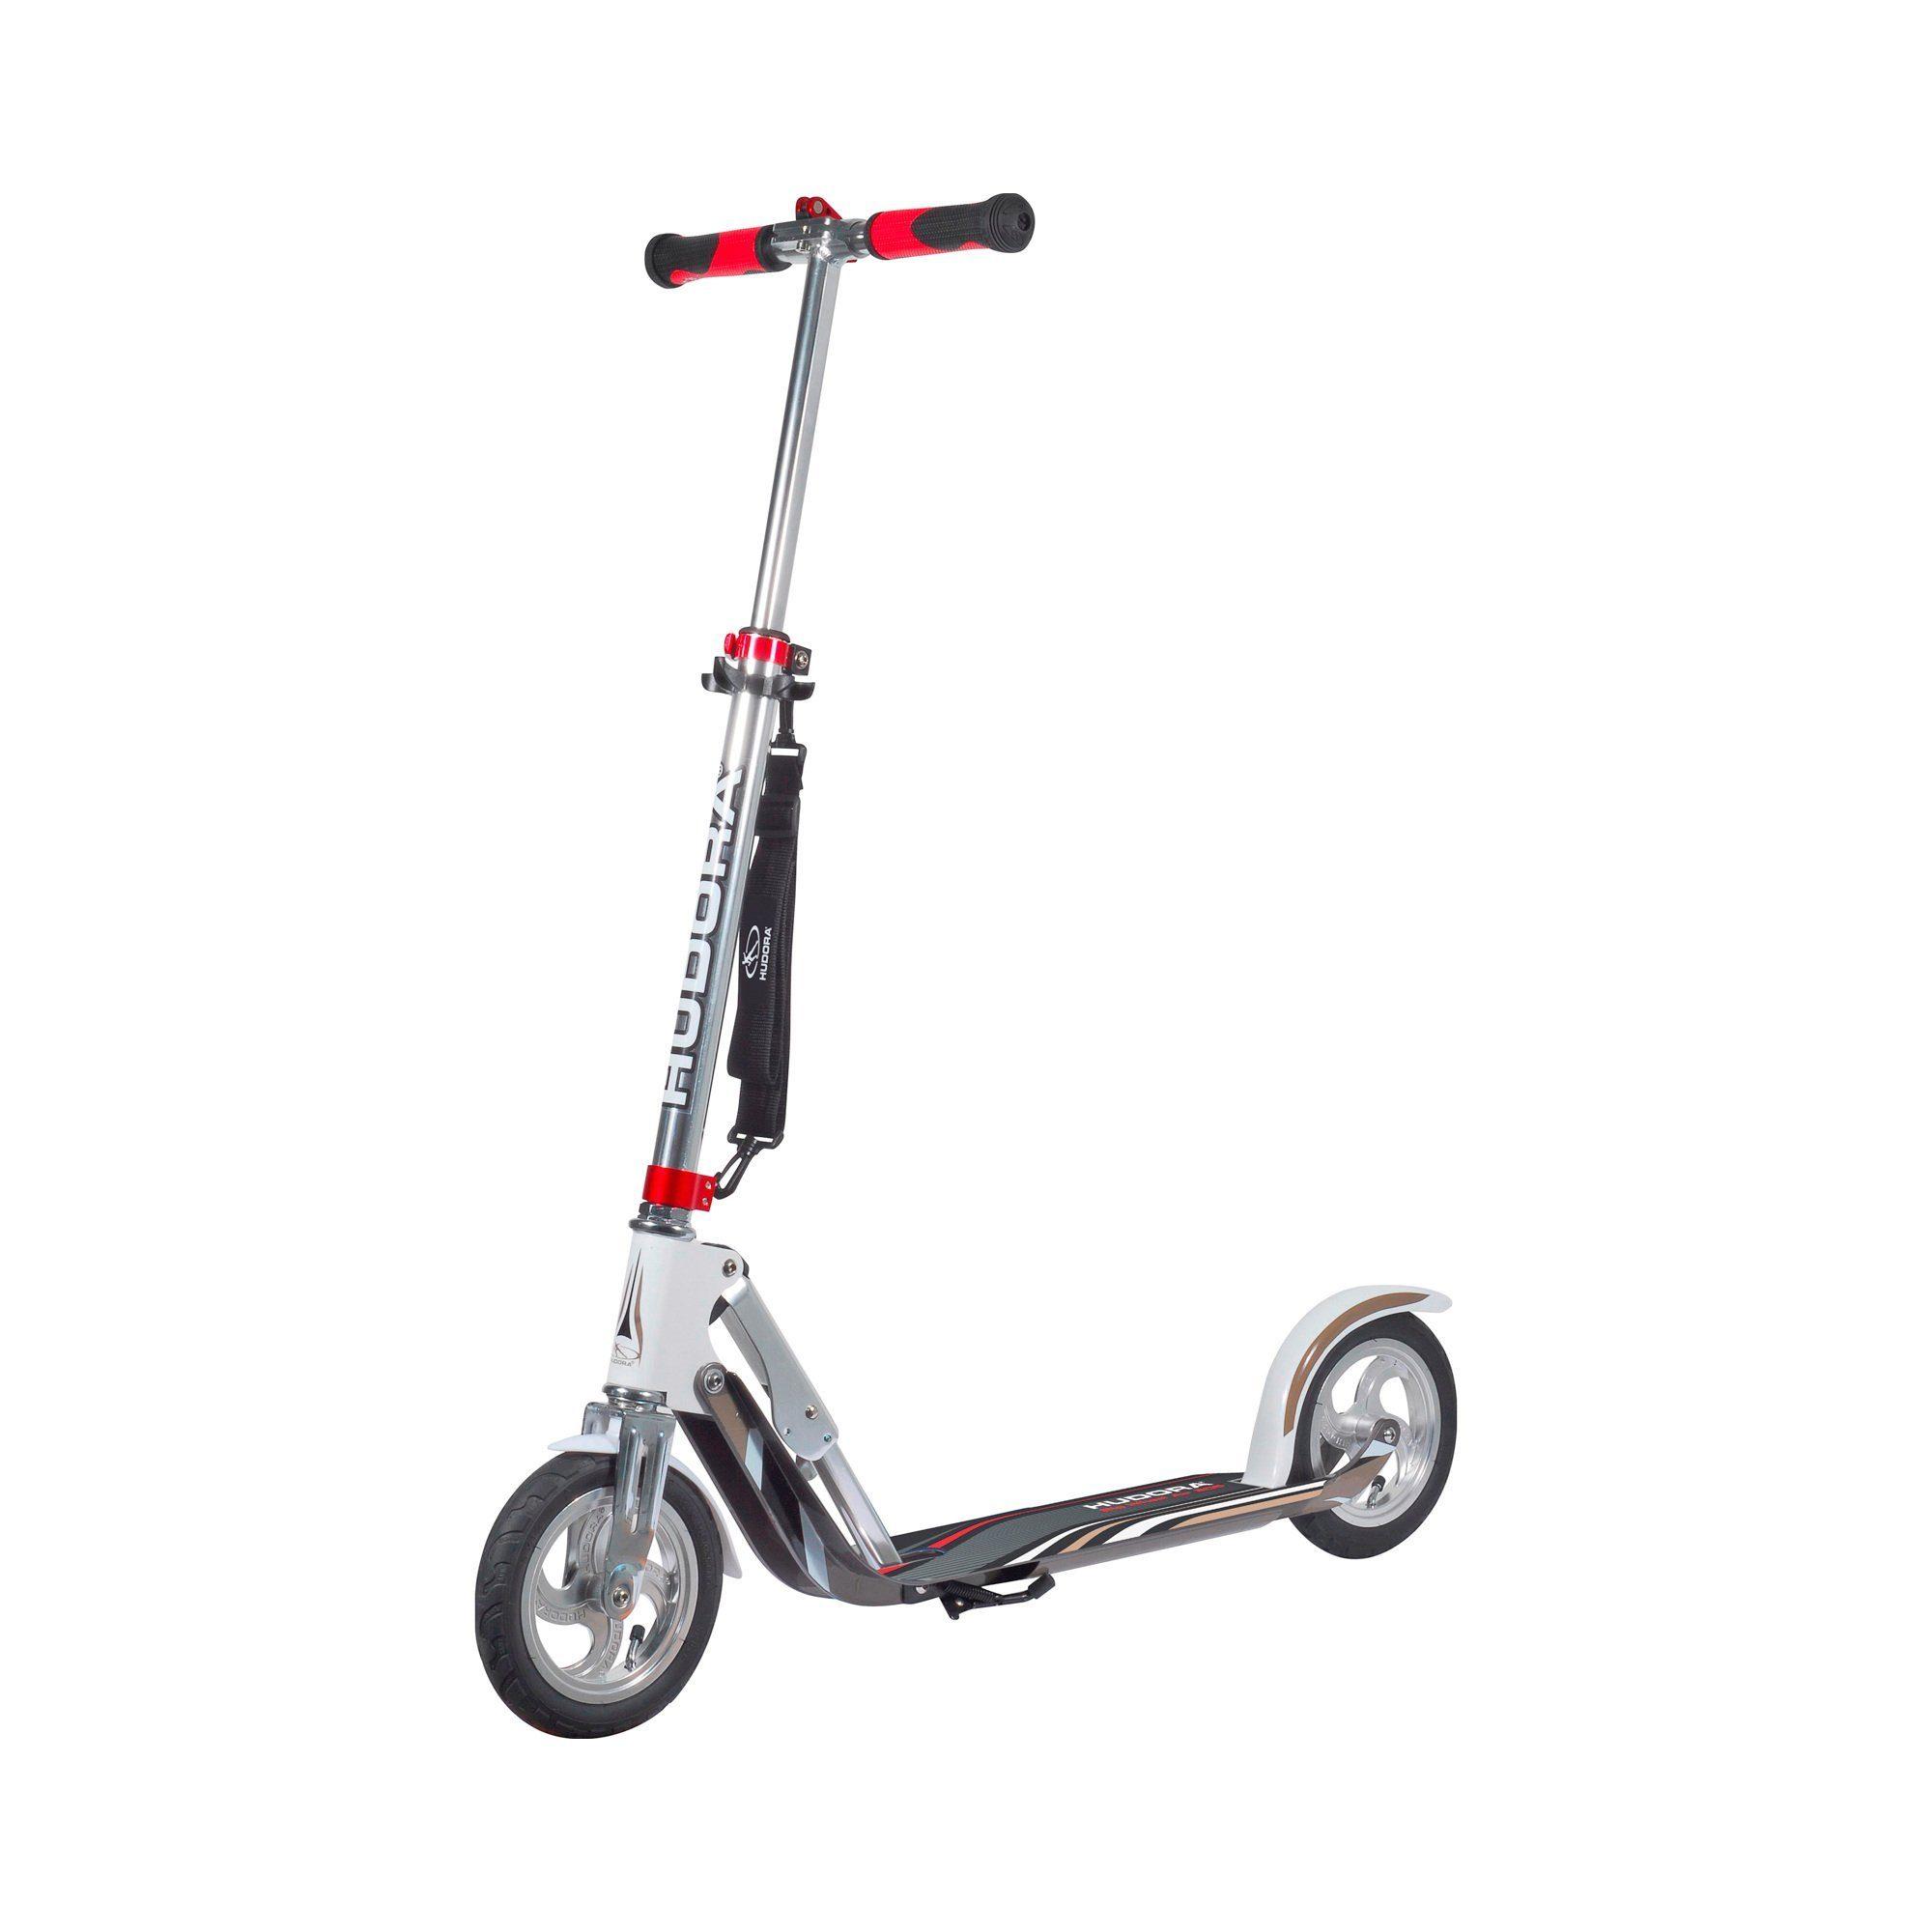 Hudora Scooter Big Wheel AIR